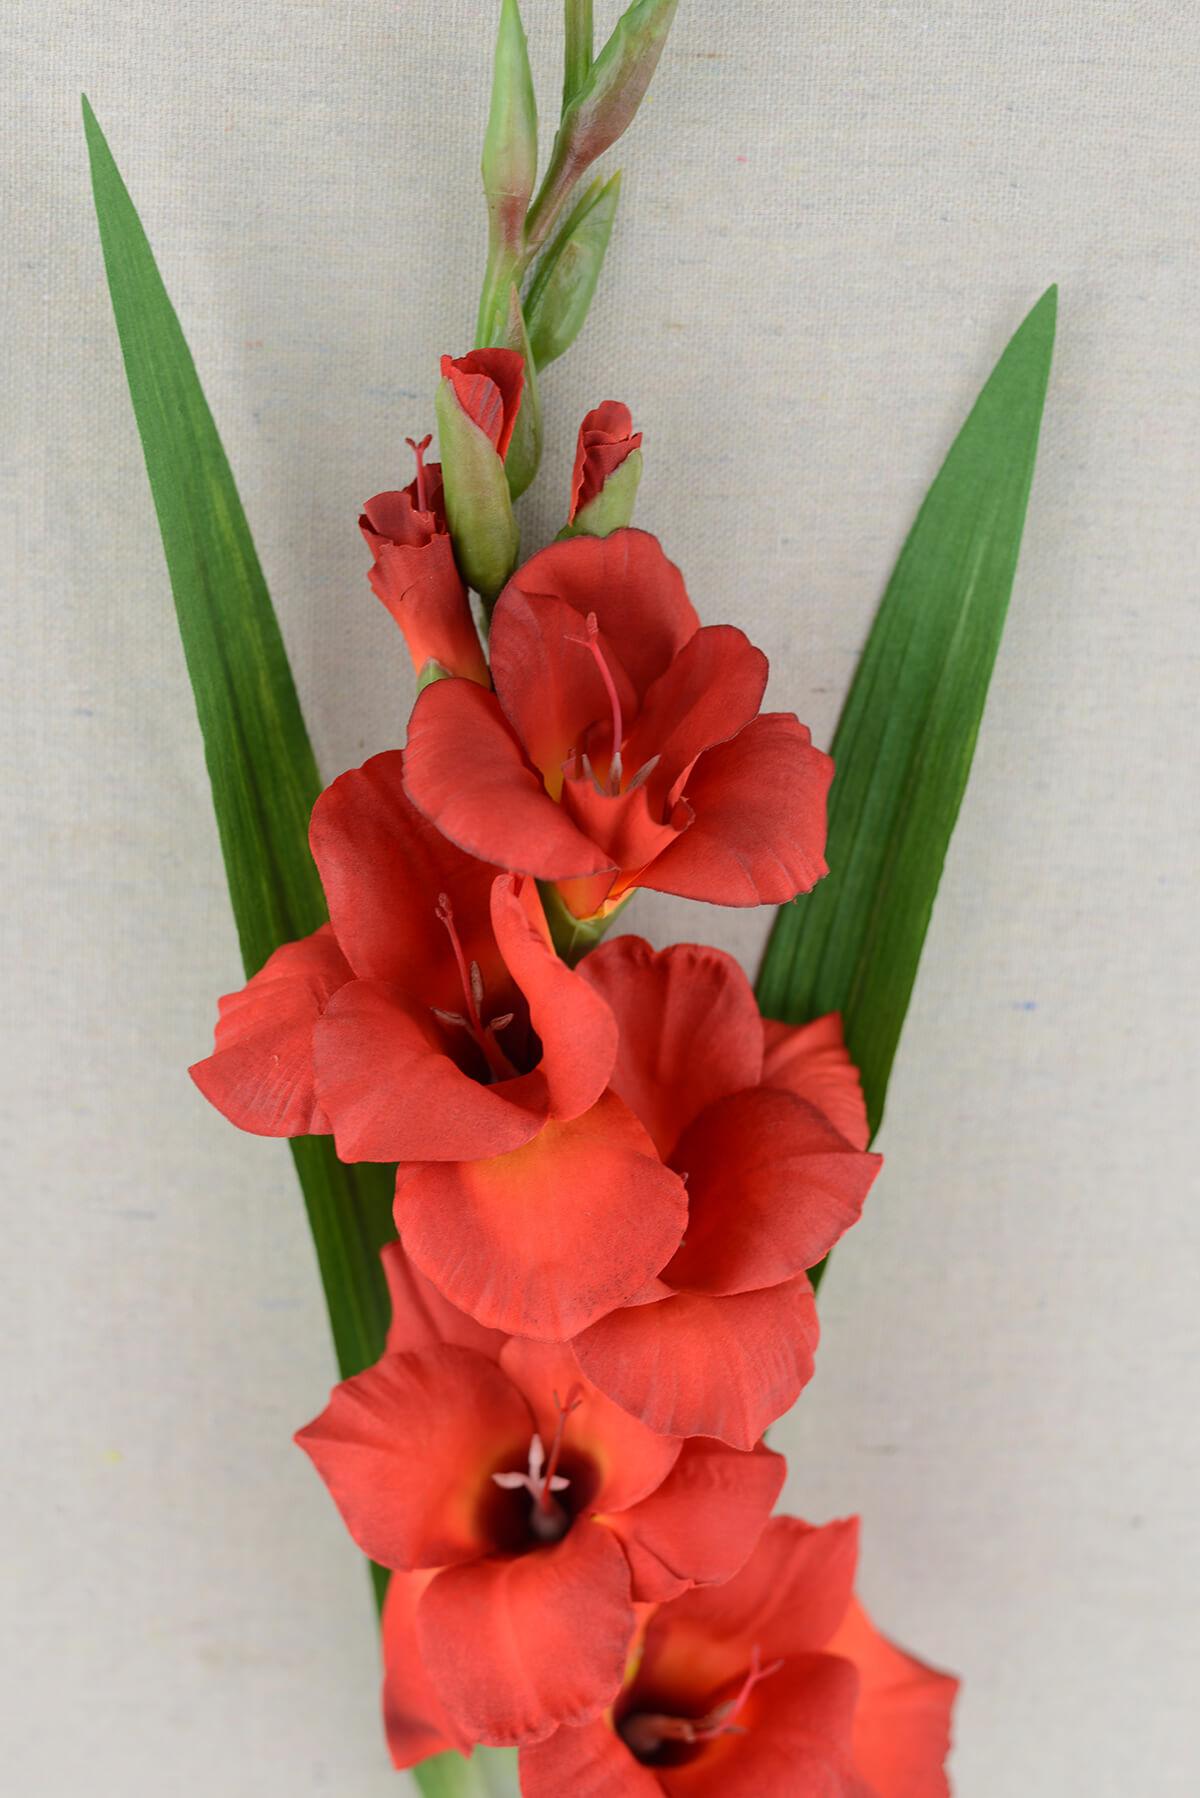 Gladiolus Flower Red 33in